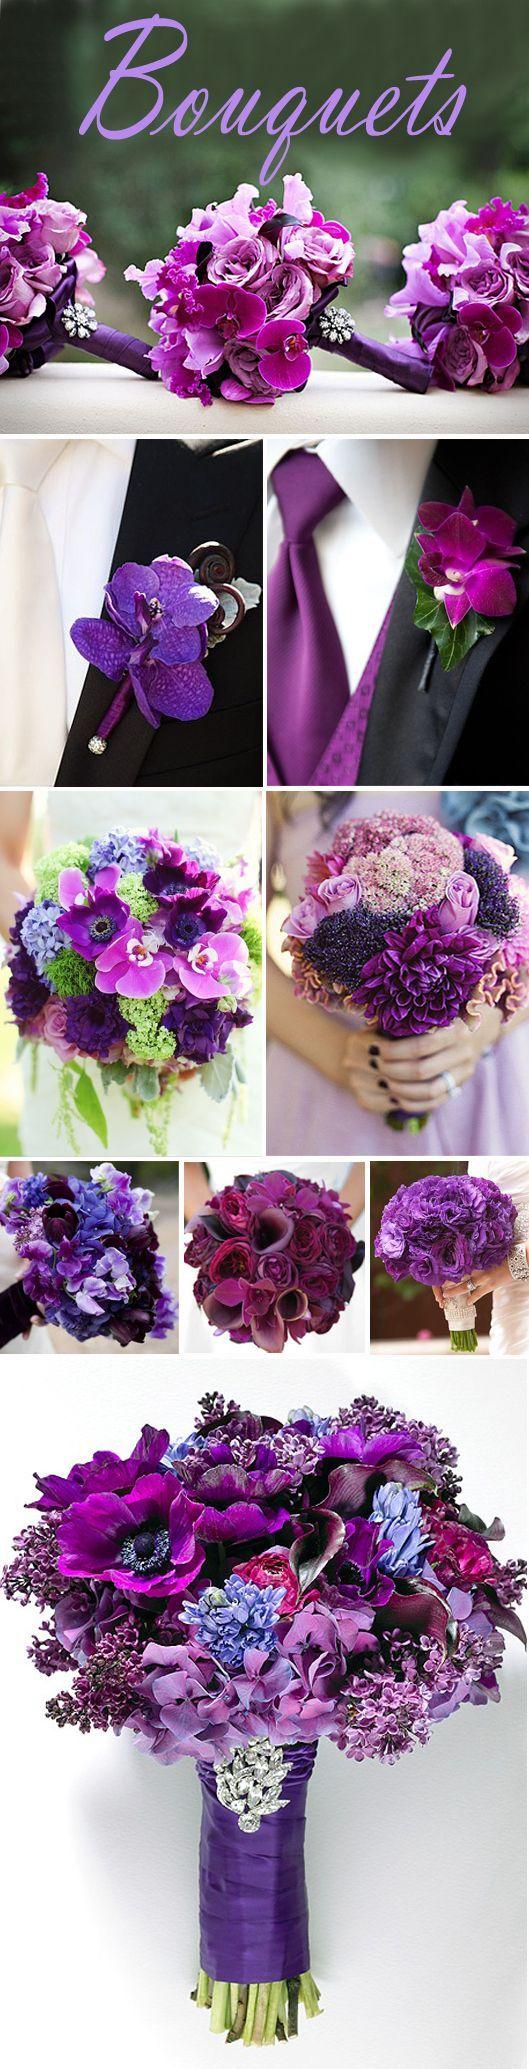 Your Wedding Color - Purple | Purple bouquets, Exclusively weddings ...